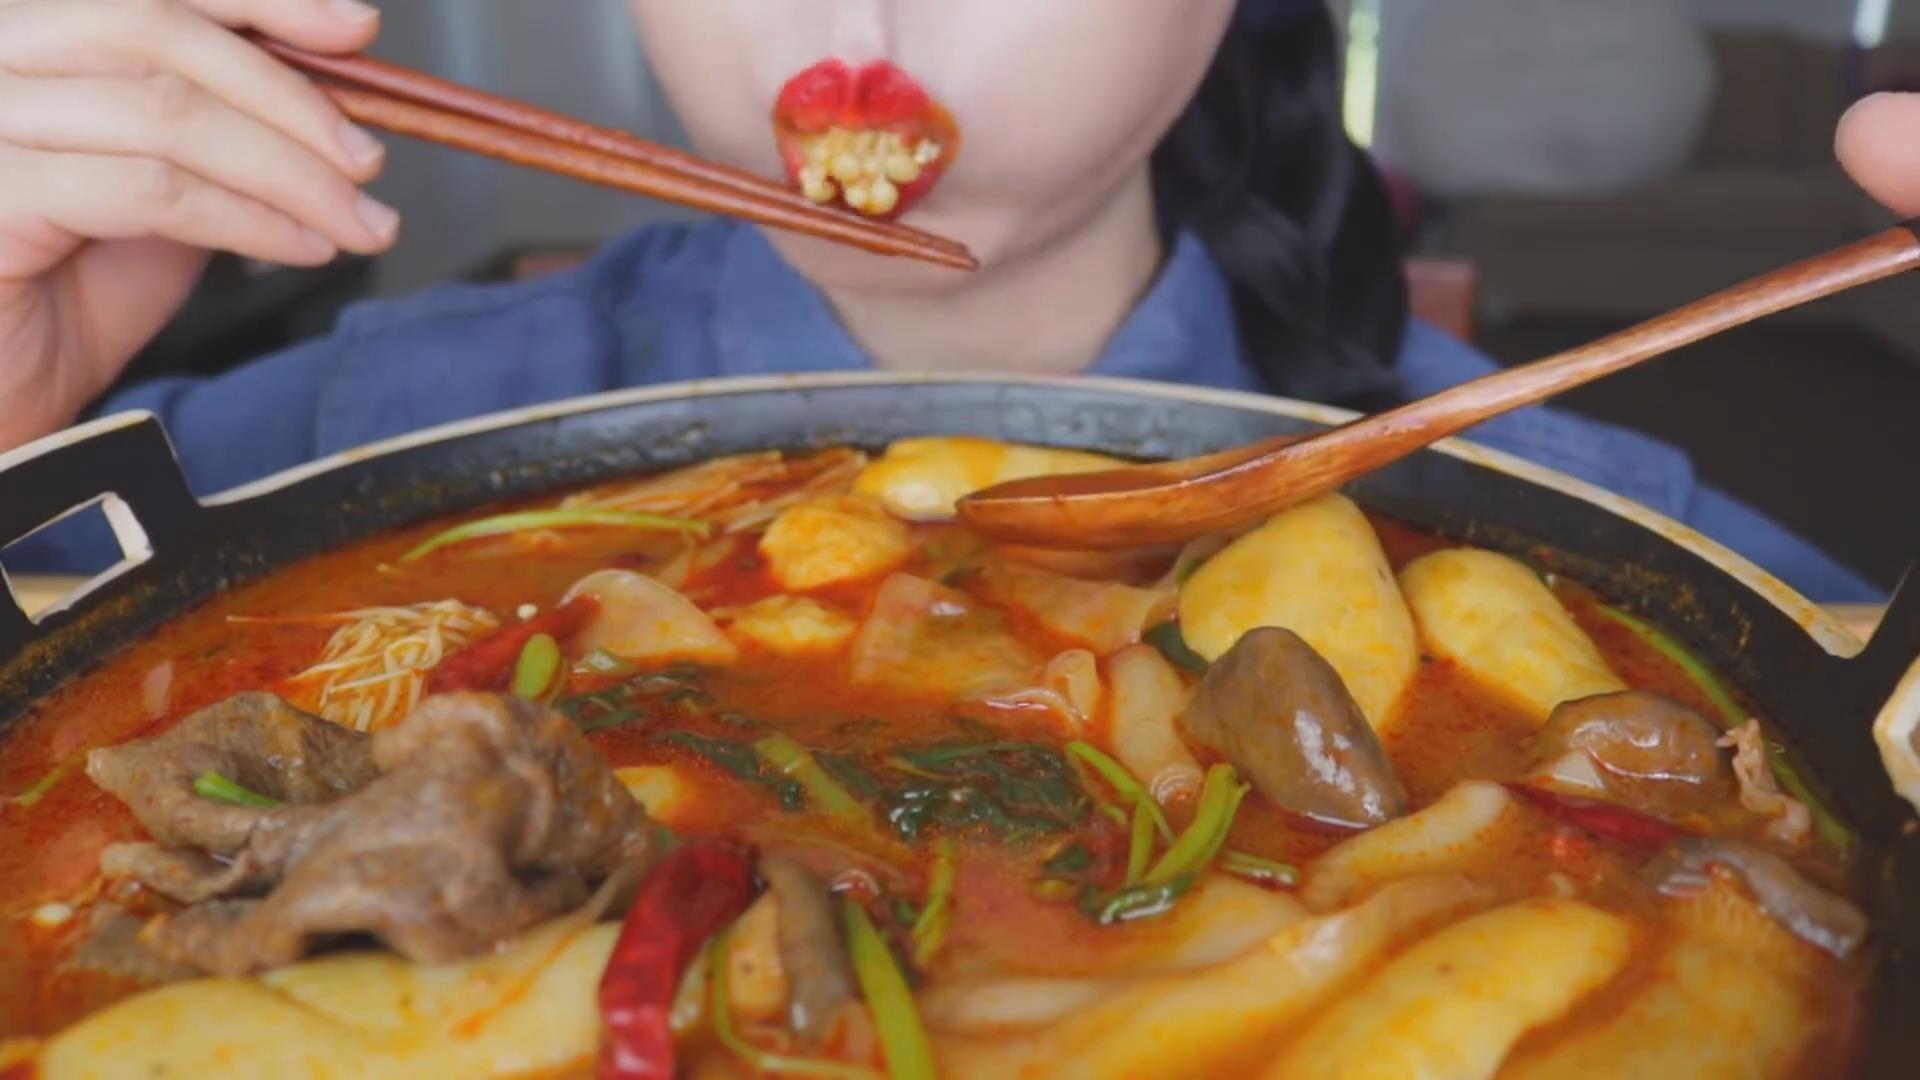 【Lychee】 麻辣烫牛肉宽粉香菇金针菇